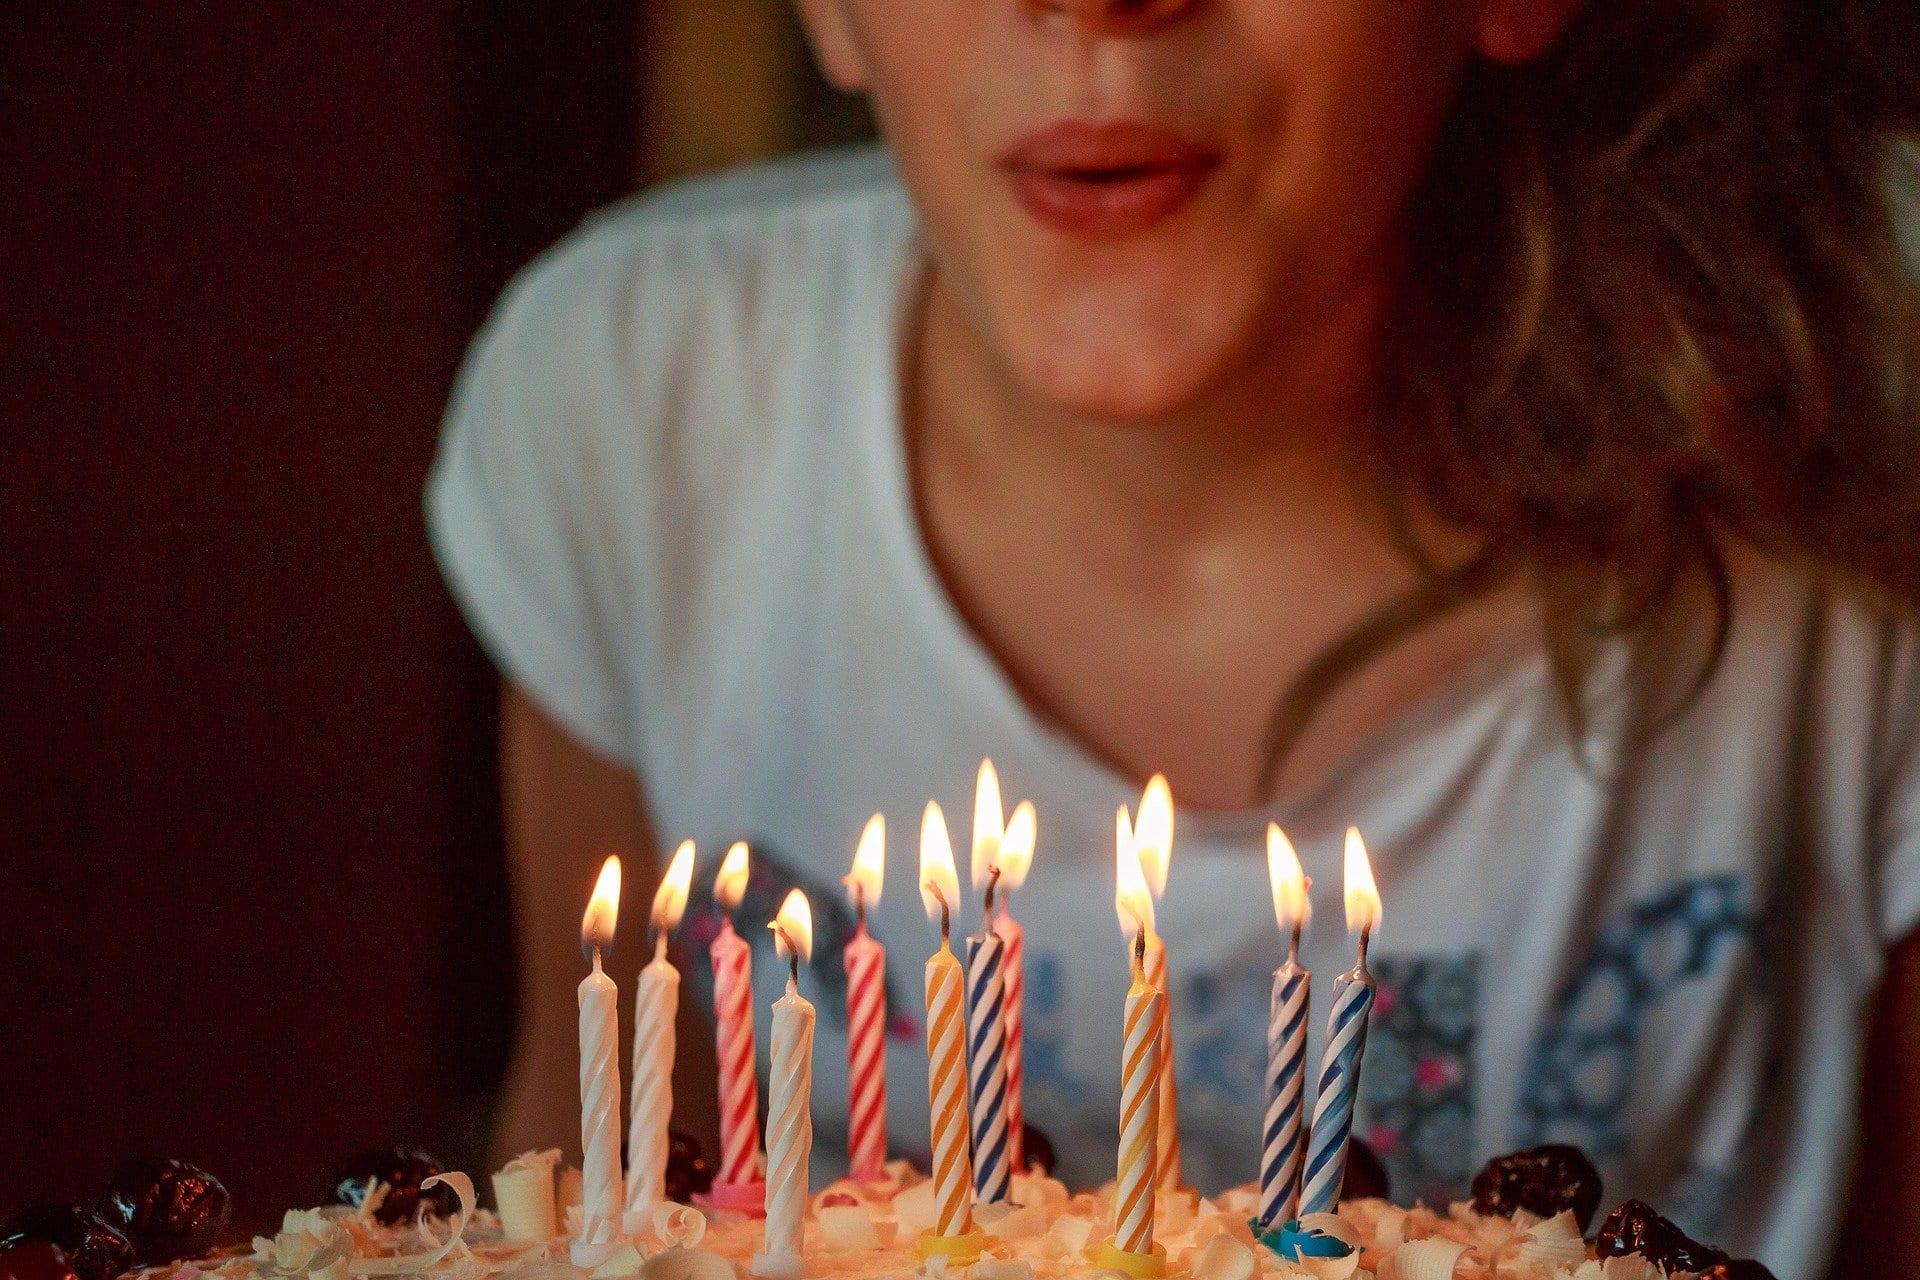 What Should I Do On My 21st Birthday?